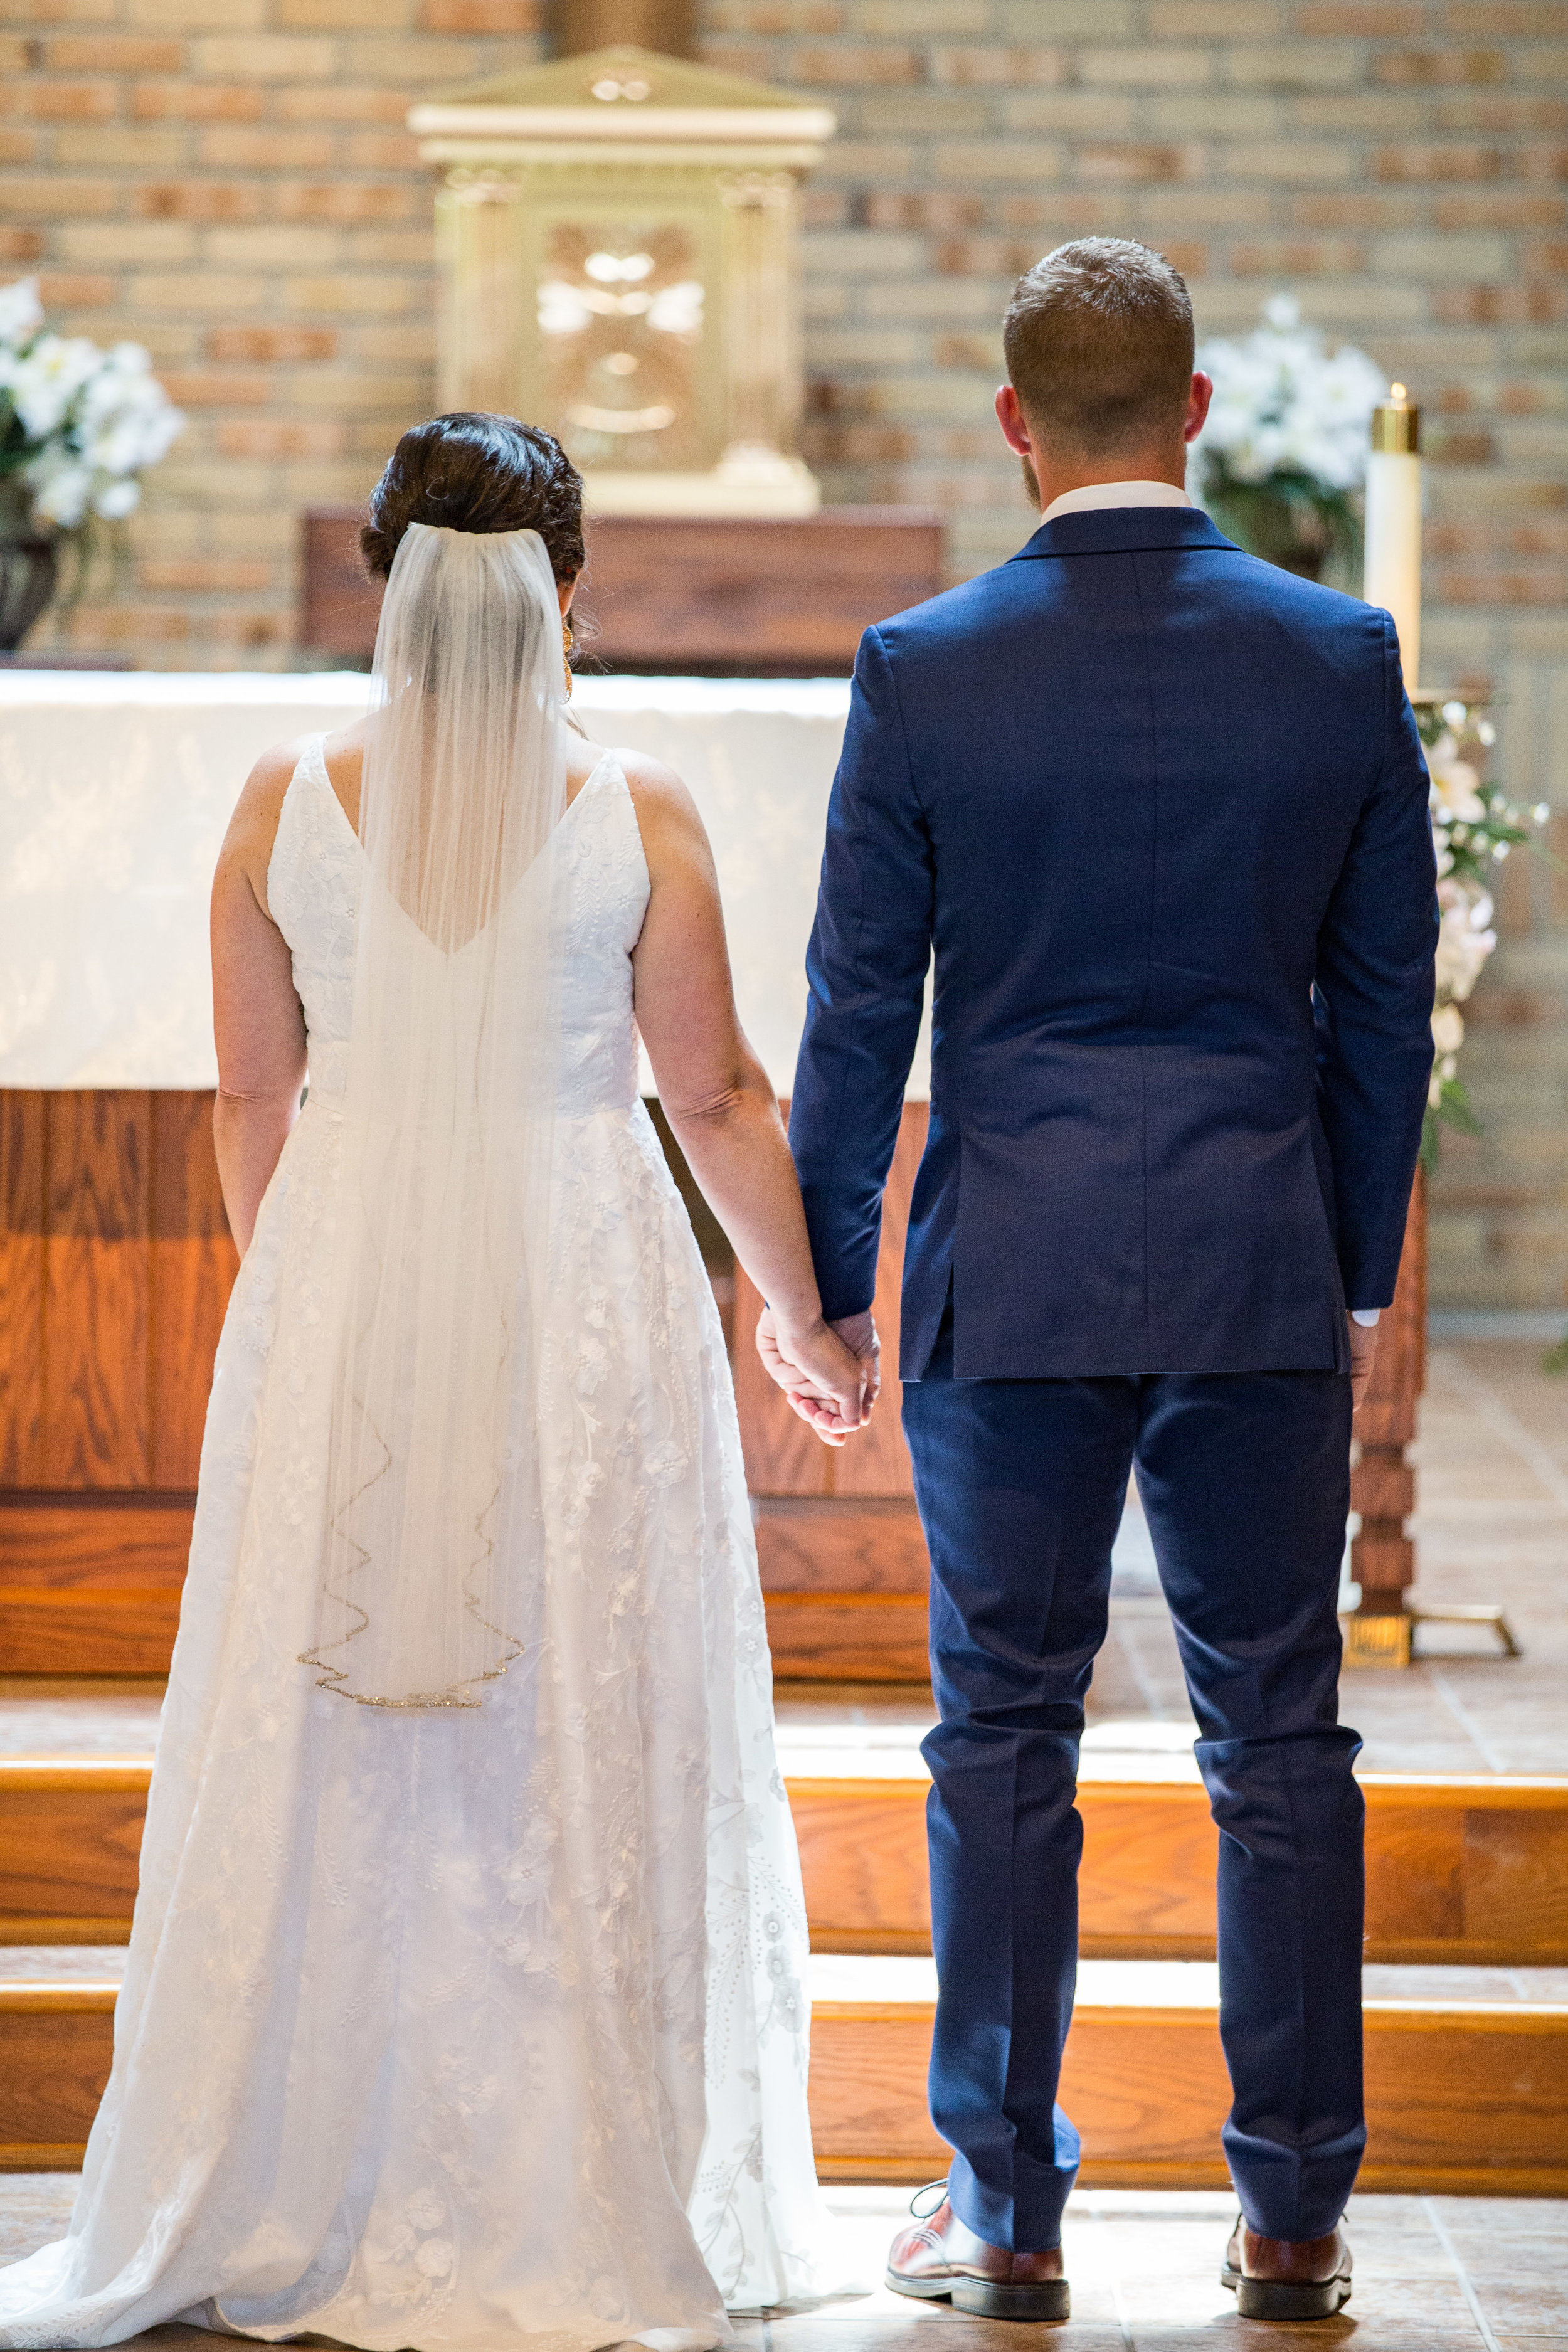 Natalie and Dallas Mooney Wedding 6-8-19_Tania Watt Photography-132.jpg